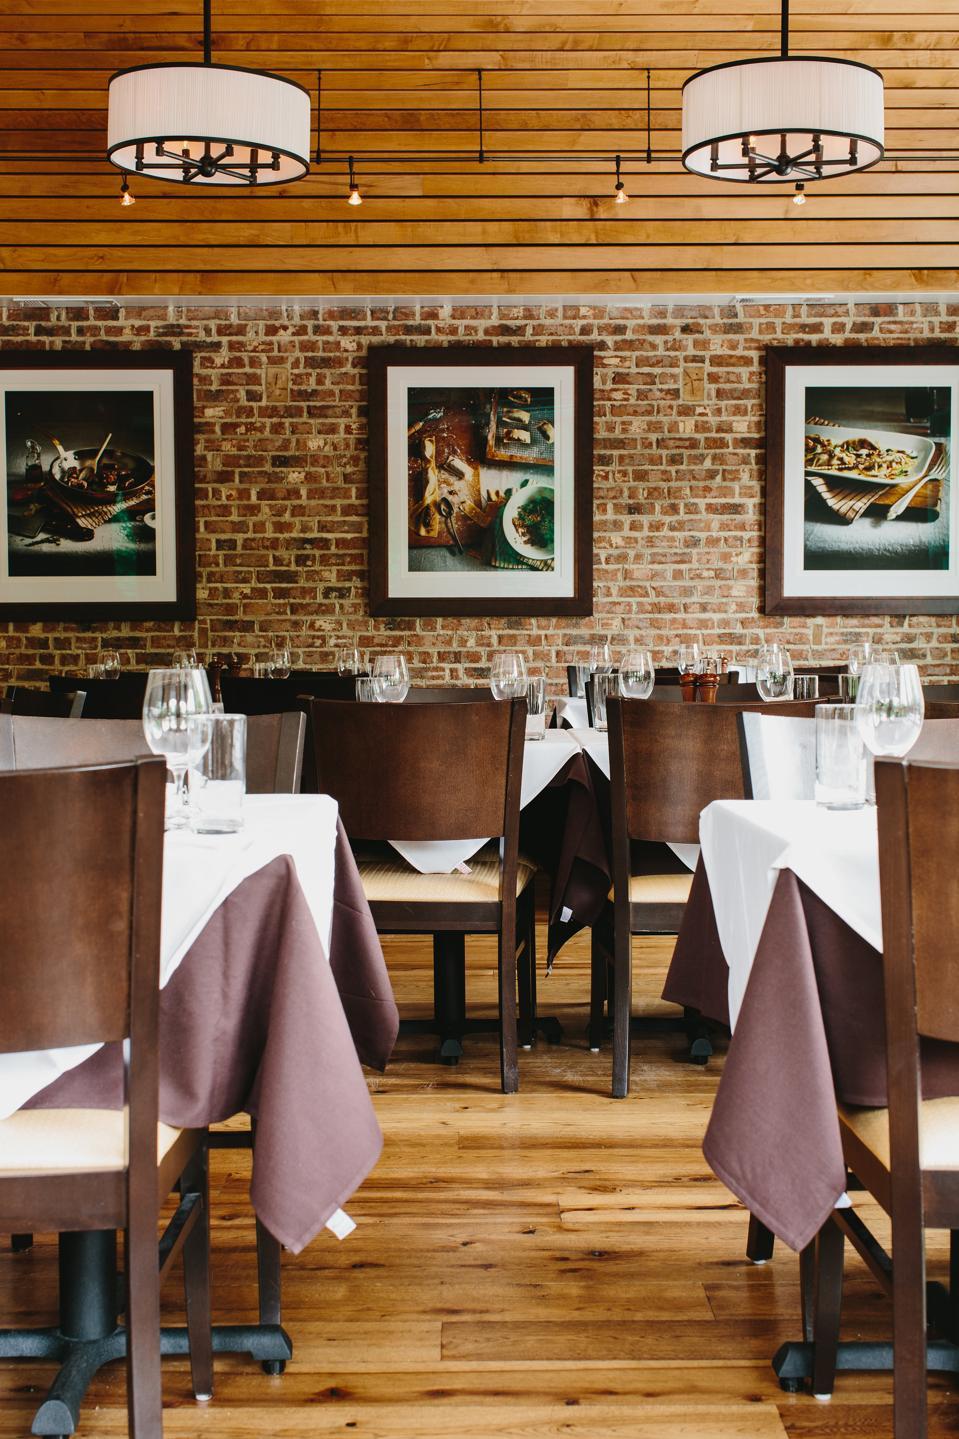 The inside of Osteria Mattone restaurant in Roswell, GA